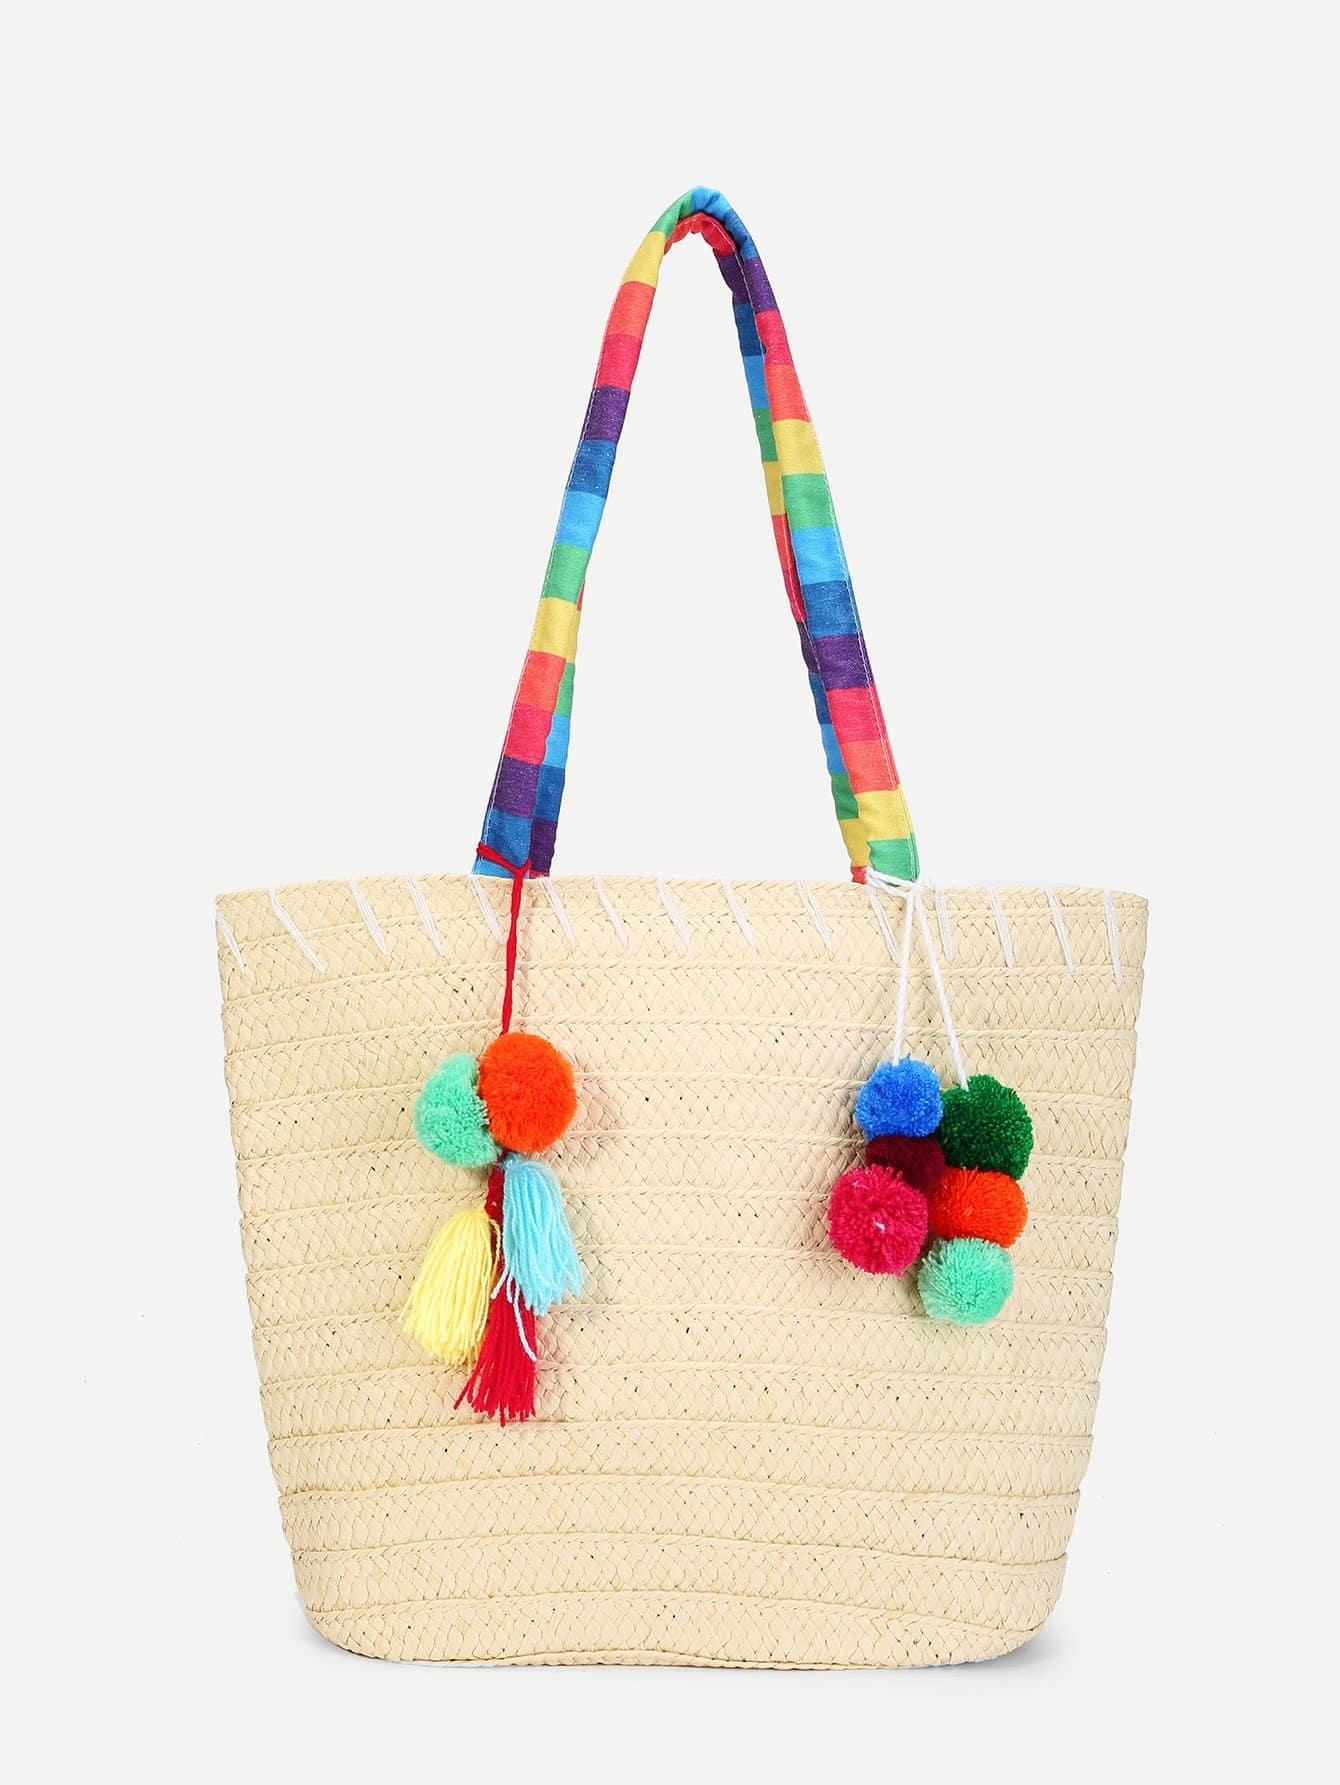 Tassel & Pom Pom Detail Straw Bag beige tassel detail straw shoulder bags